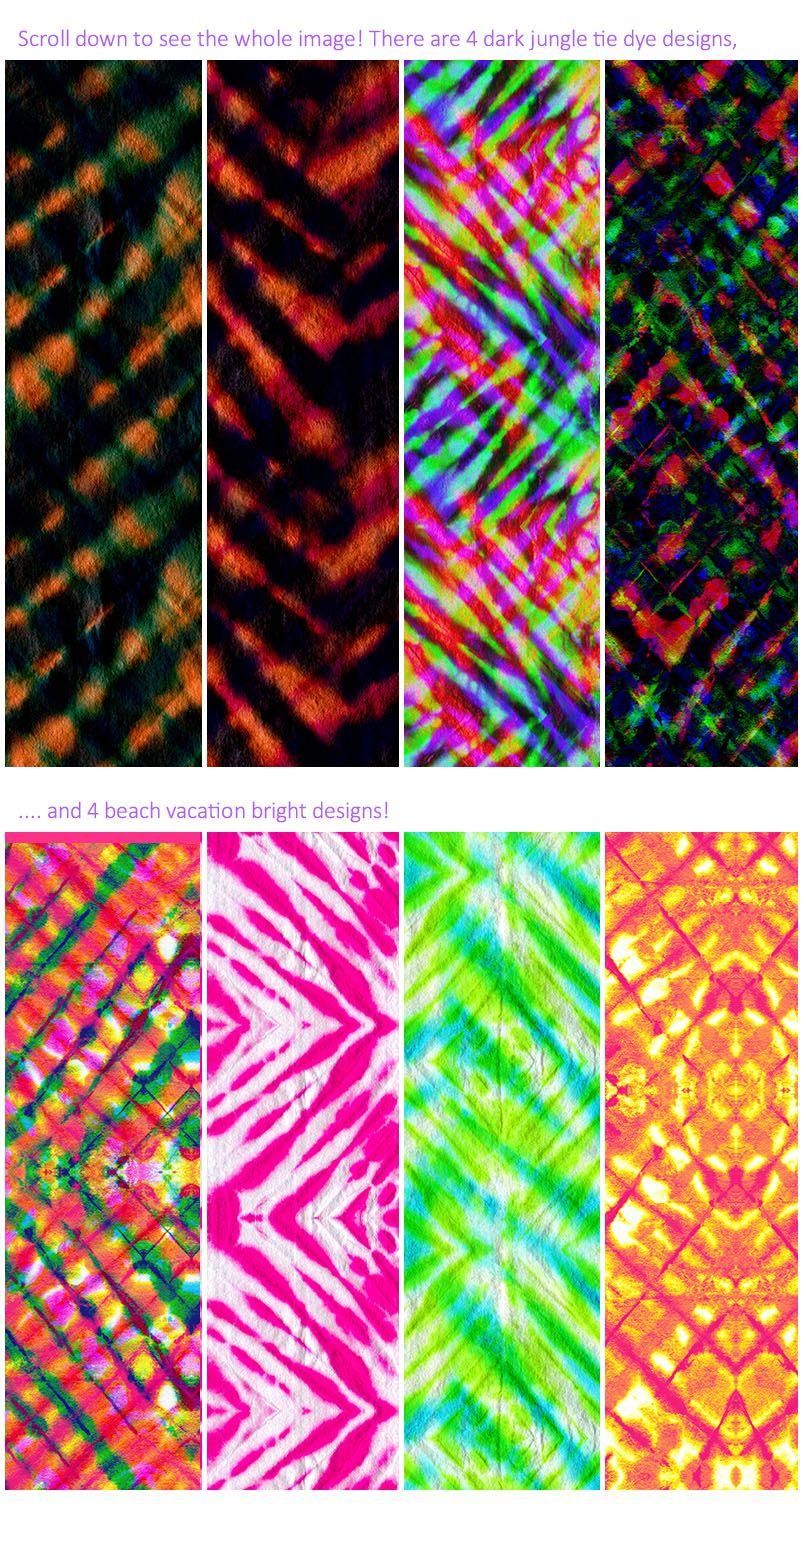 Tie dye and ikats httpscreativemarketrosapompelmo crafts tie dye and ikats httpscreativemarketrosapompelmo baditri Gallery